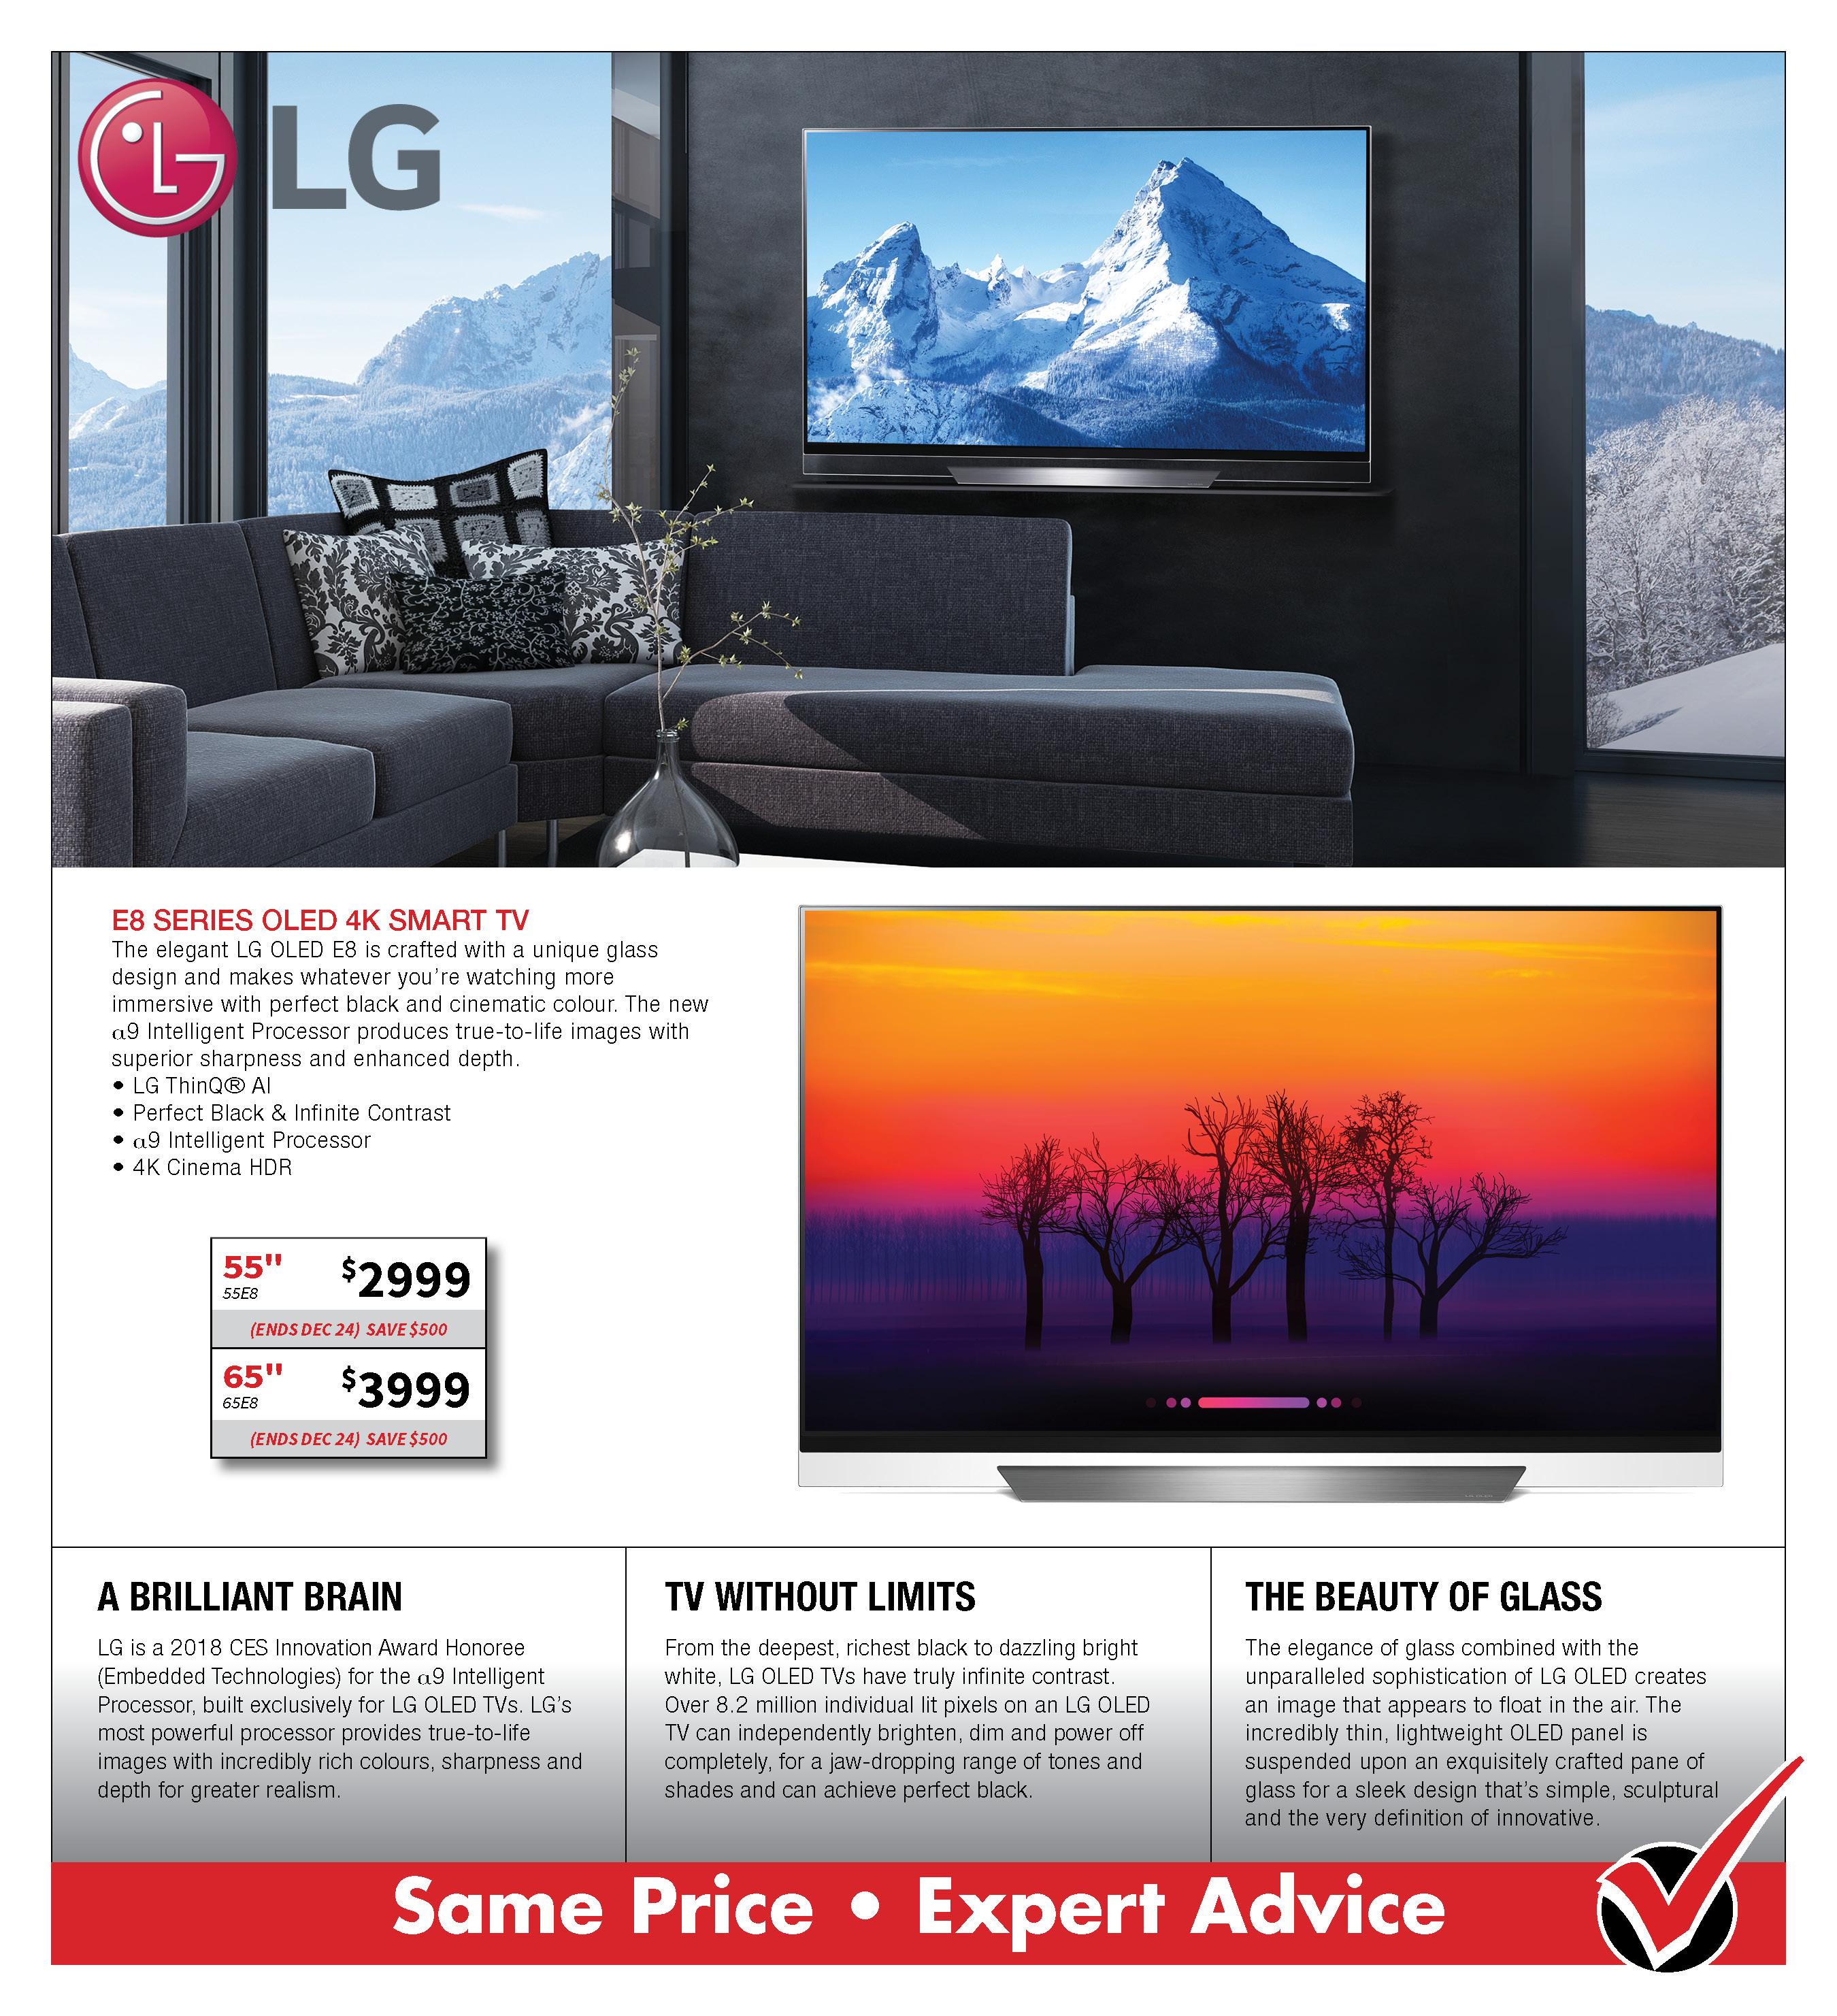 LG E8 OLed 4K Smart TV